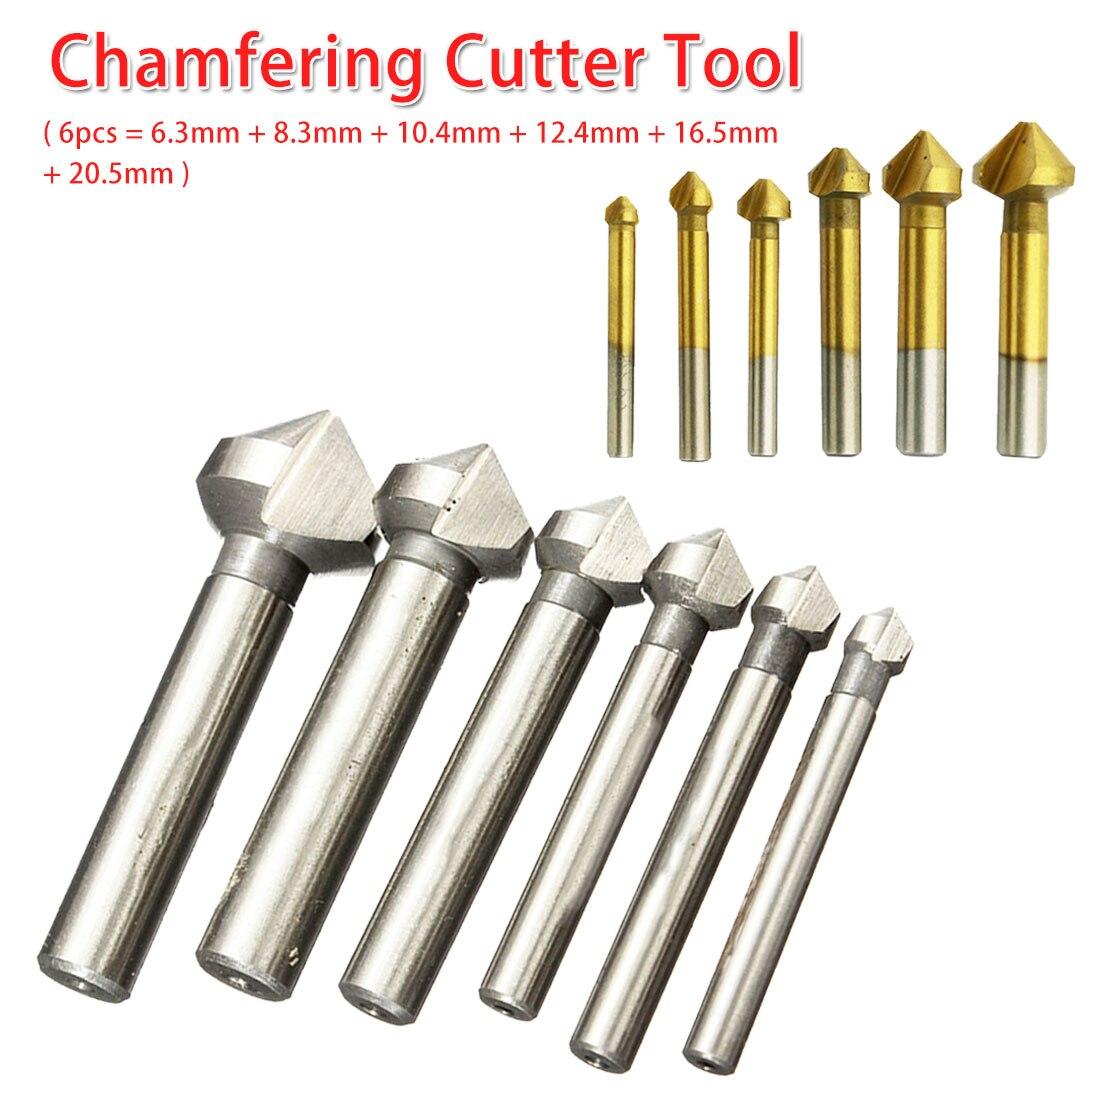 3 Flute 90 Degree 6pcs/1pcs Countersink Drill Bit Round Handle HSS Wood Steel Chamfer Cutter 6.3-20.5mm For Carbon Steel/ PVC